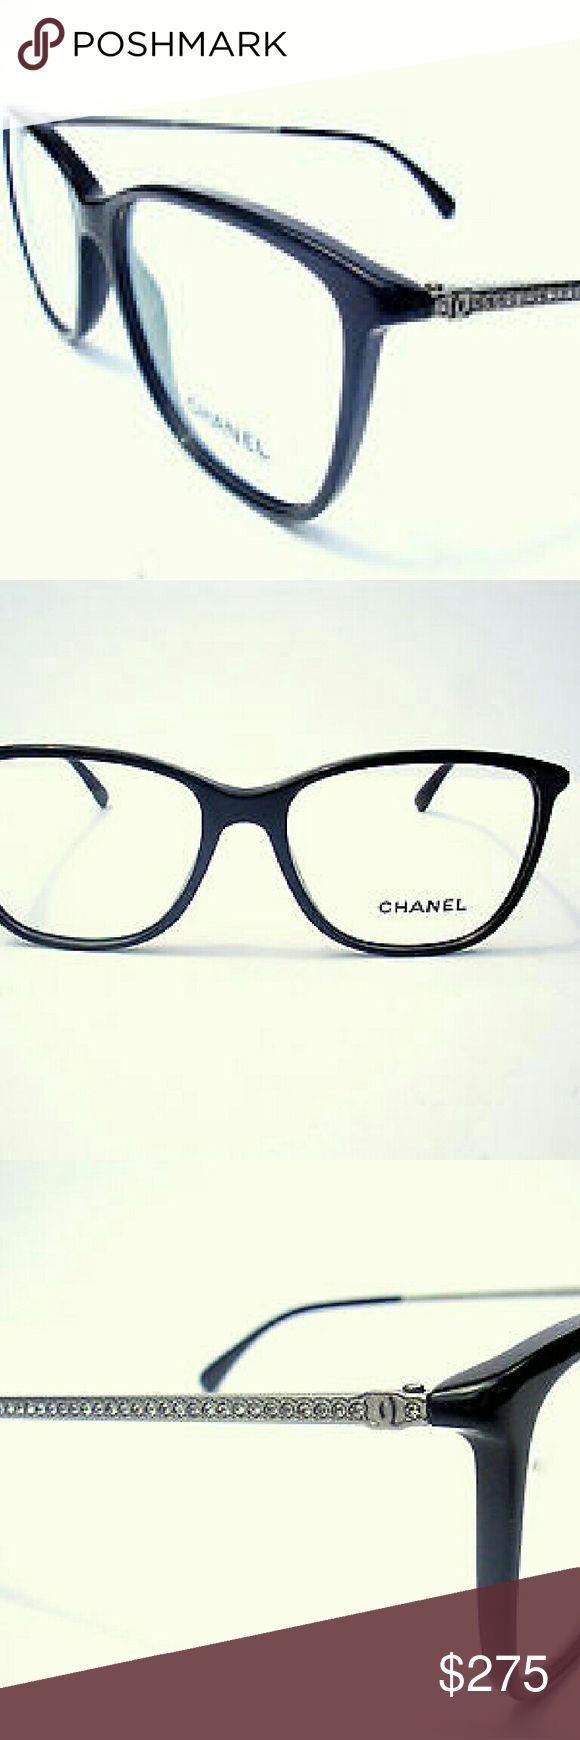 Chanel Eyeglasses New authentic Chanel Eyeglasses  Black frame with crystals on … – My Posh Picks